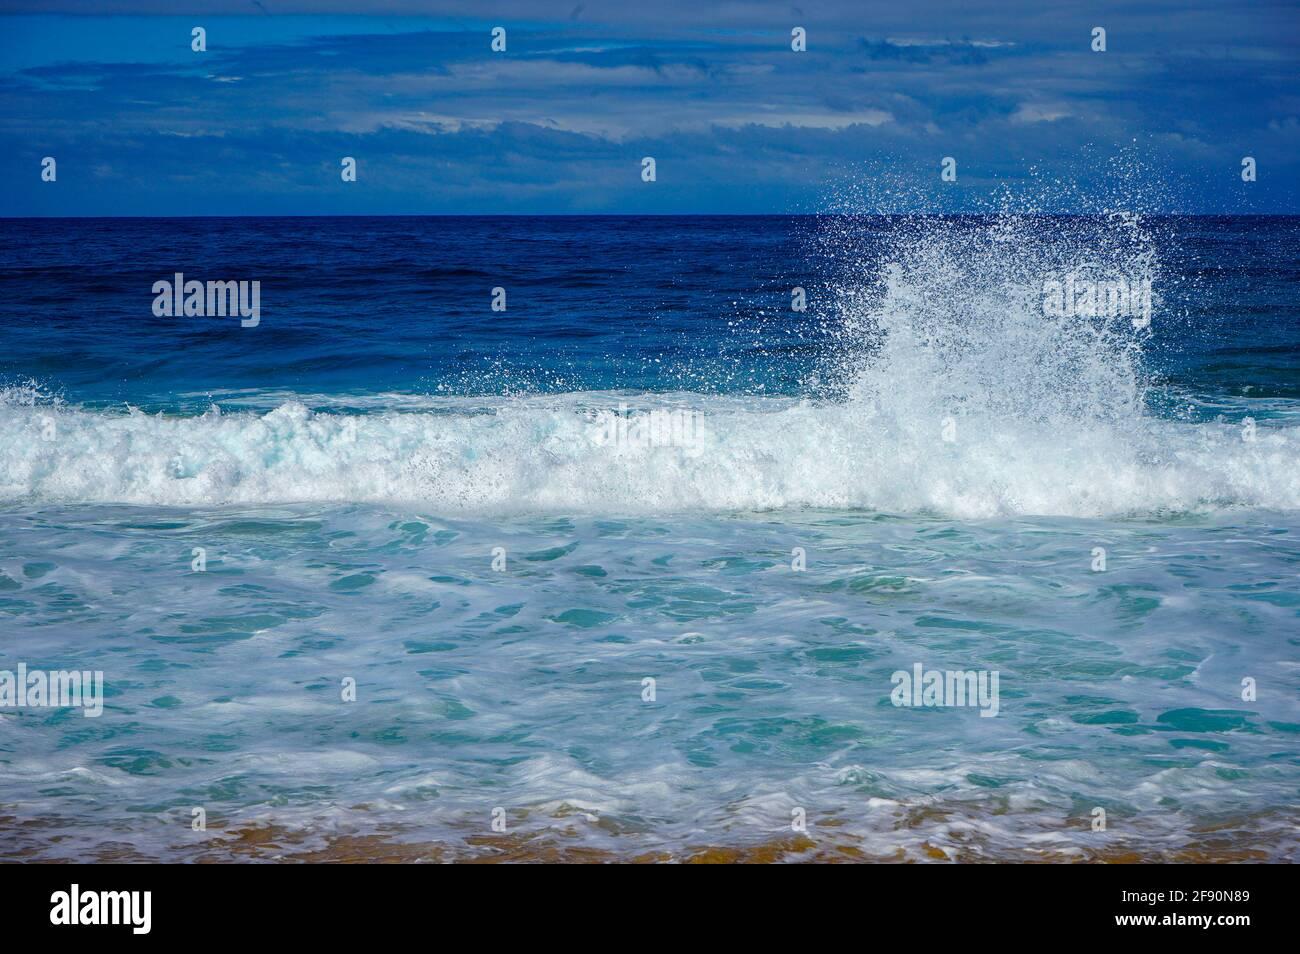 Waves crashing along Sunset Beach, Pupukea, North Shore, Oahu, Hawaii, USA Stock Photo